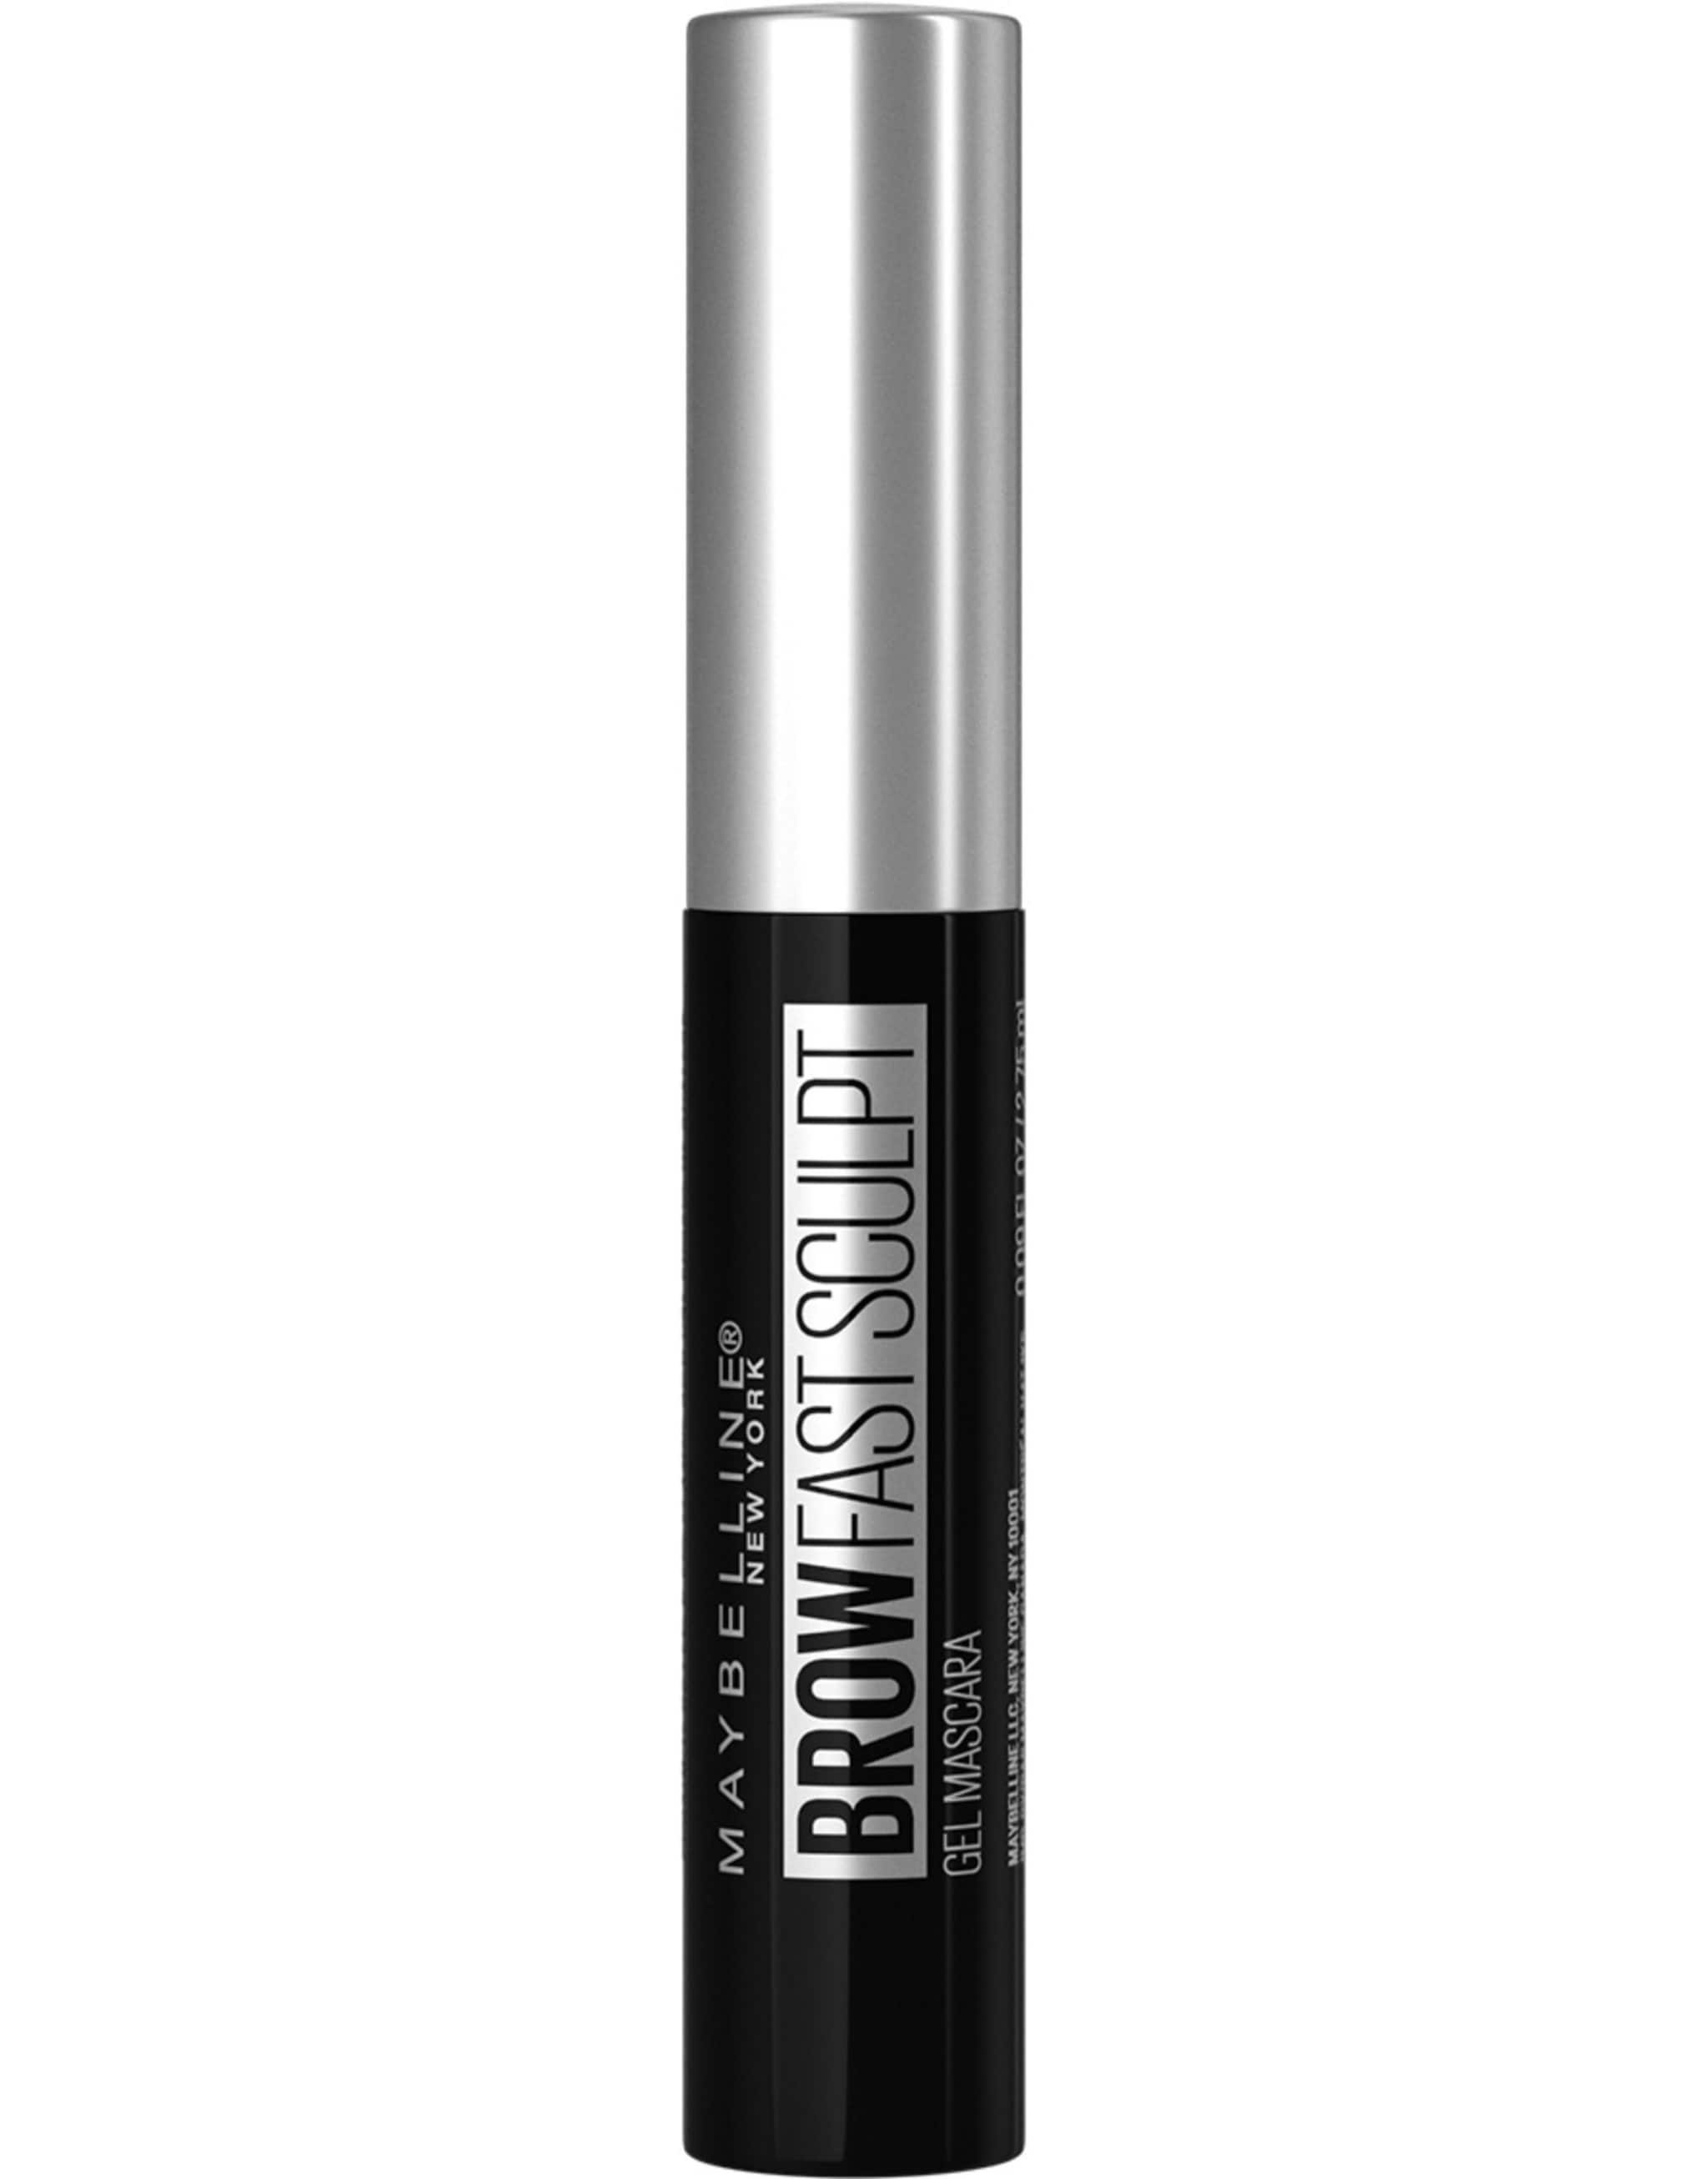 Maybelline Brow Fast Sculpt Eyebrow Gel 10 Clear 5